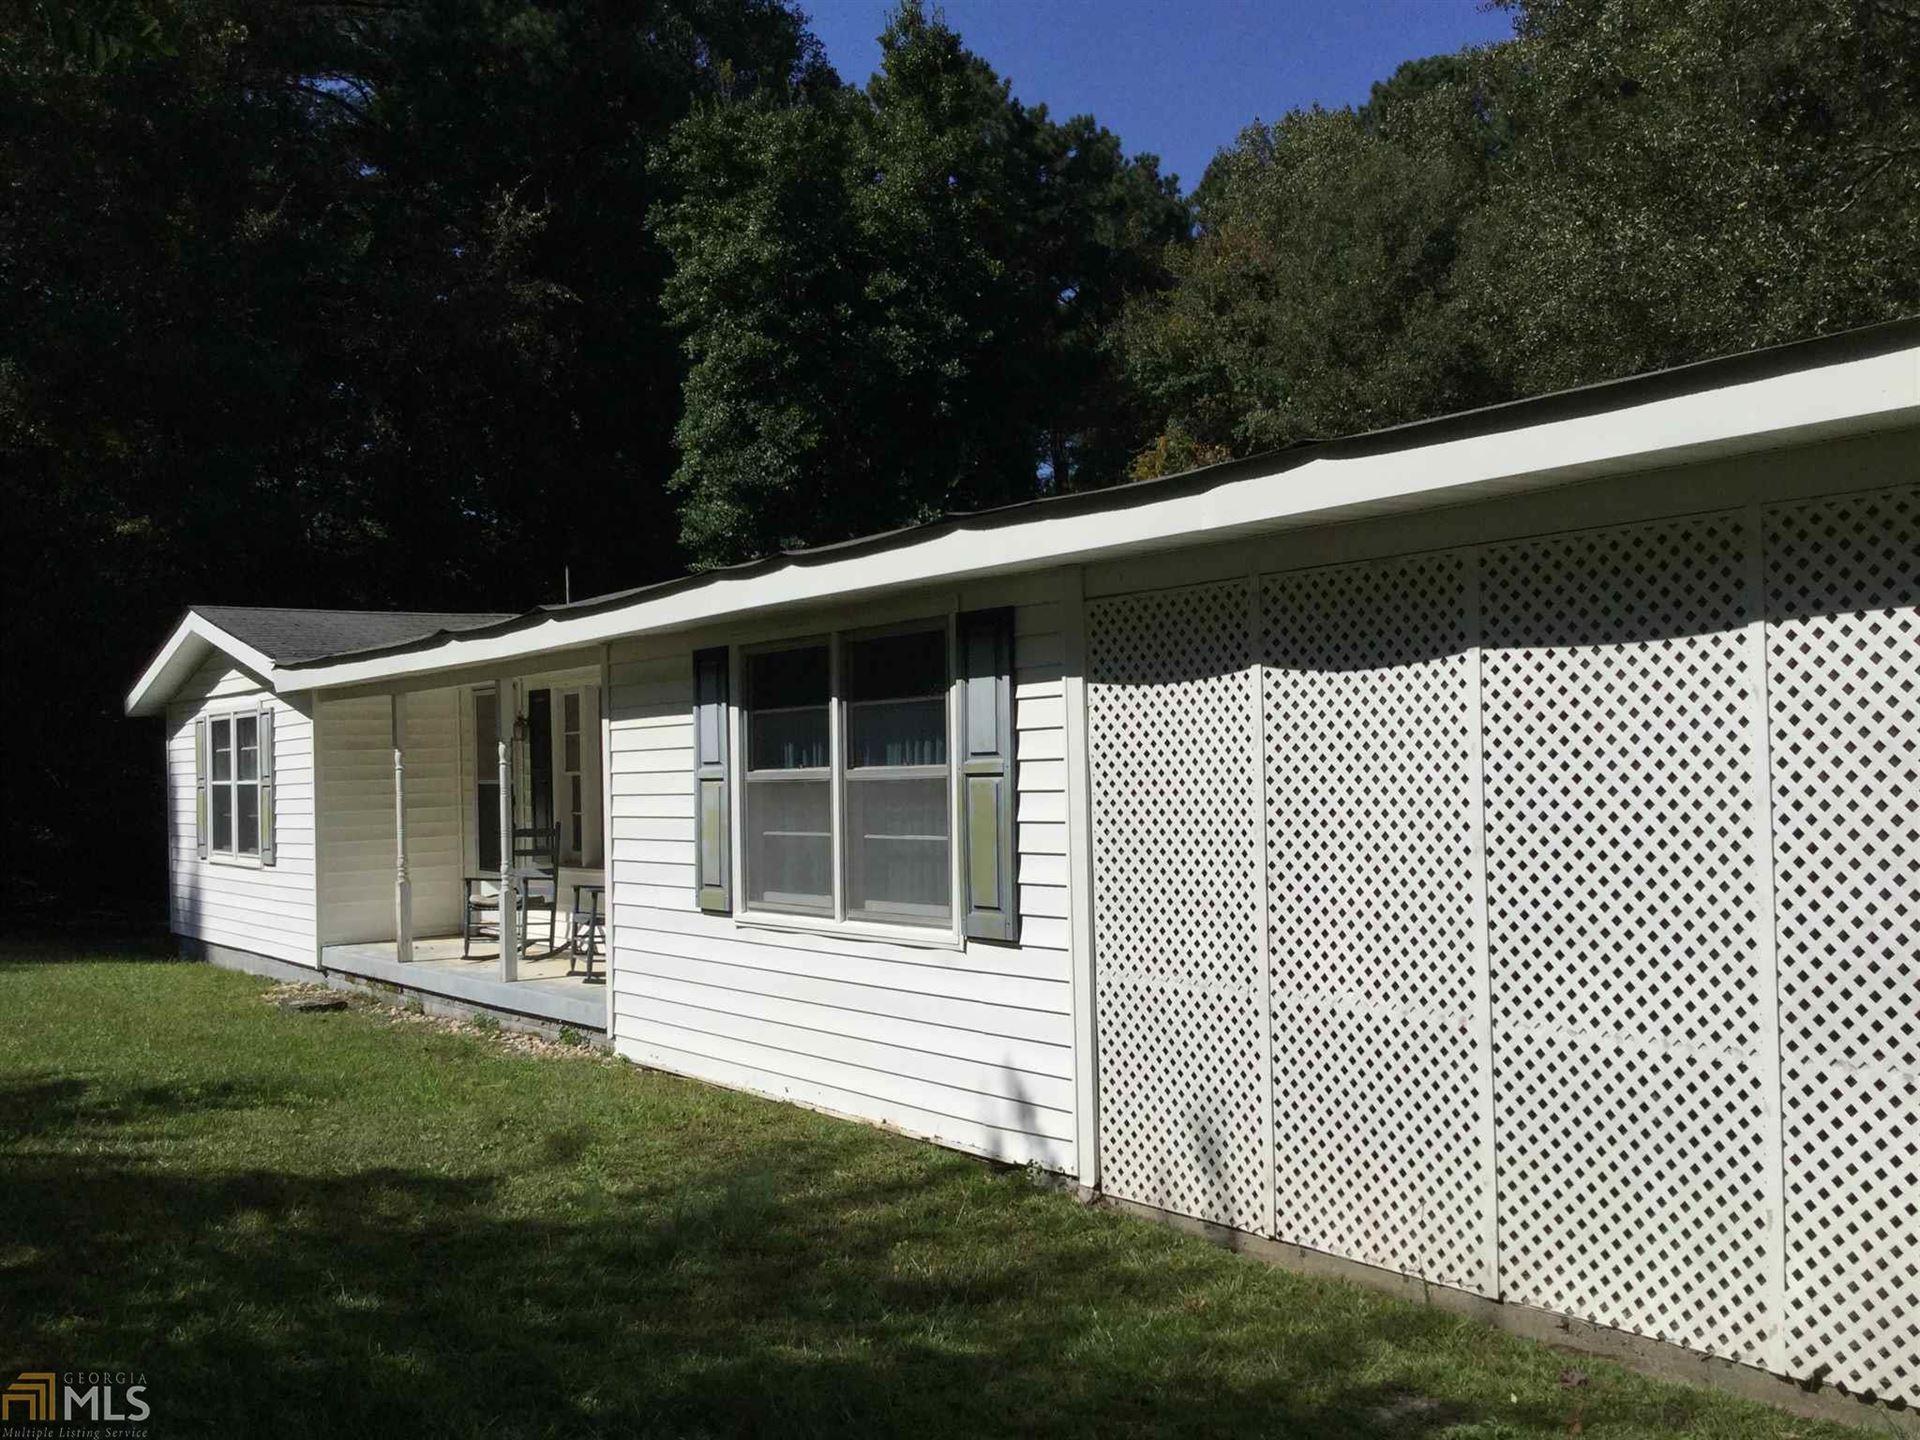 135 Brentwood Rd, Tyrone, GA 30290 - MLS#: 8873349